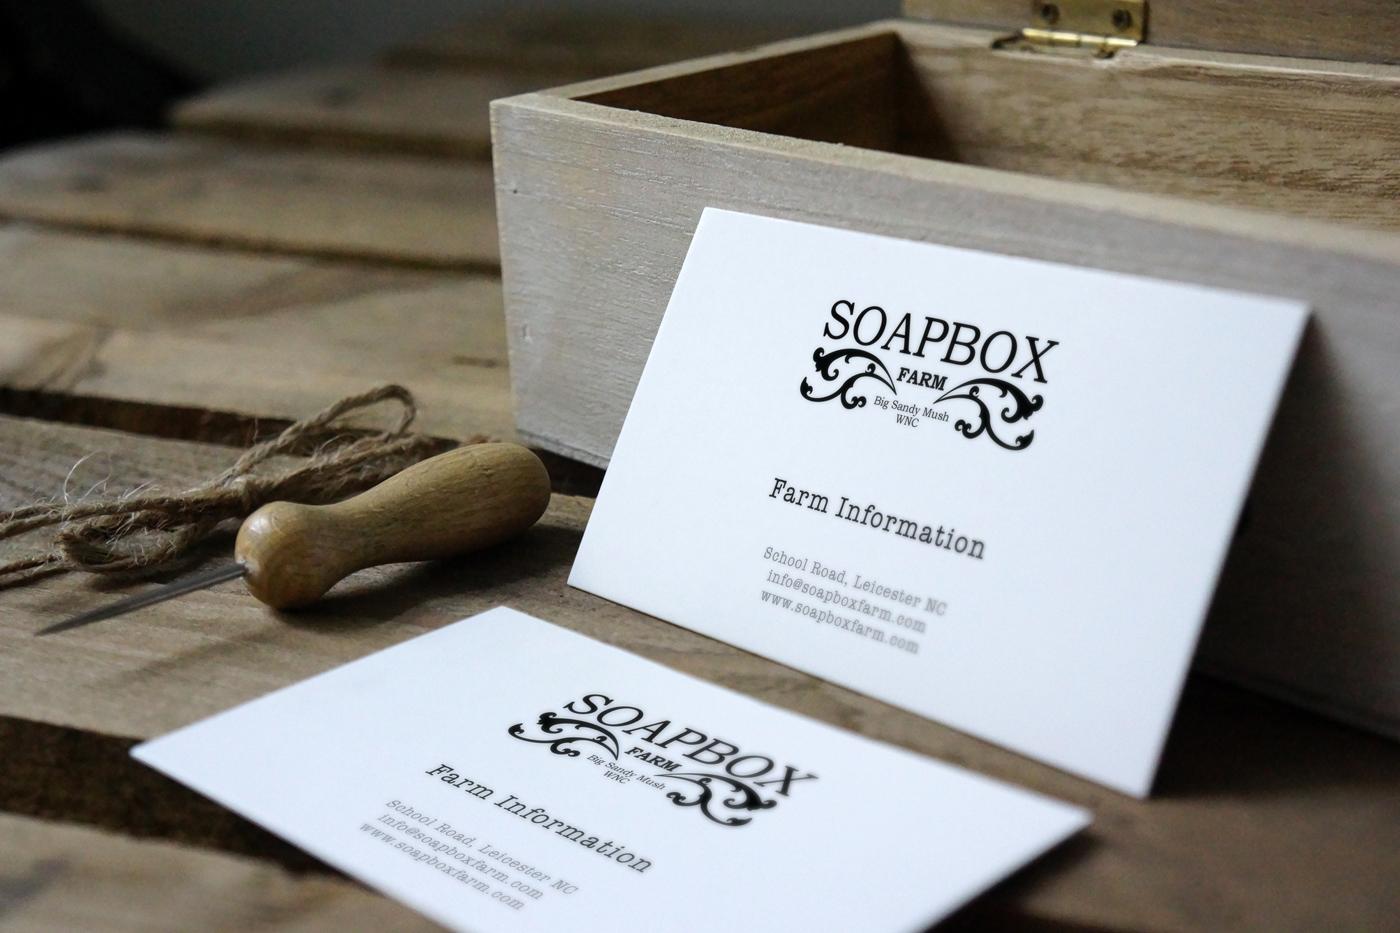 CLASSIC BUSINESS CARD Soapbox Farm